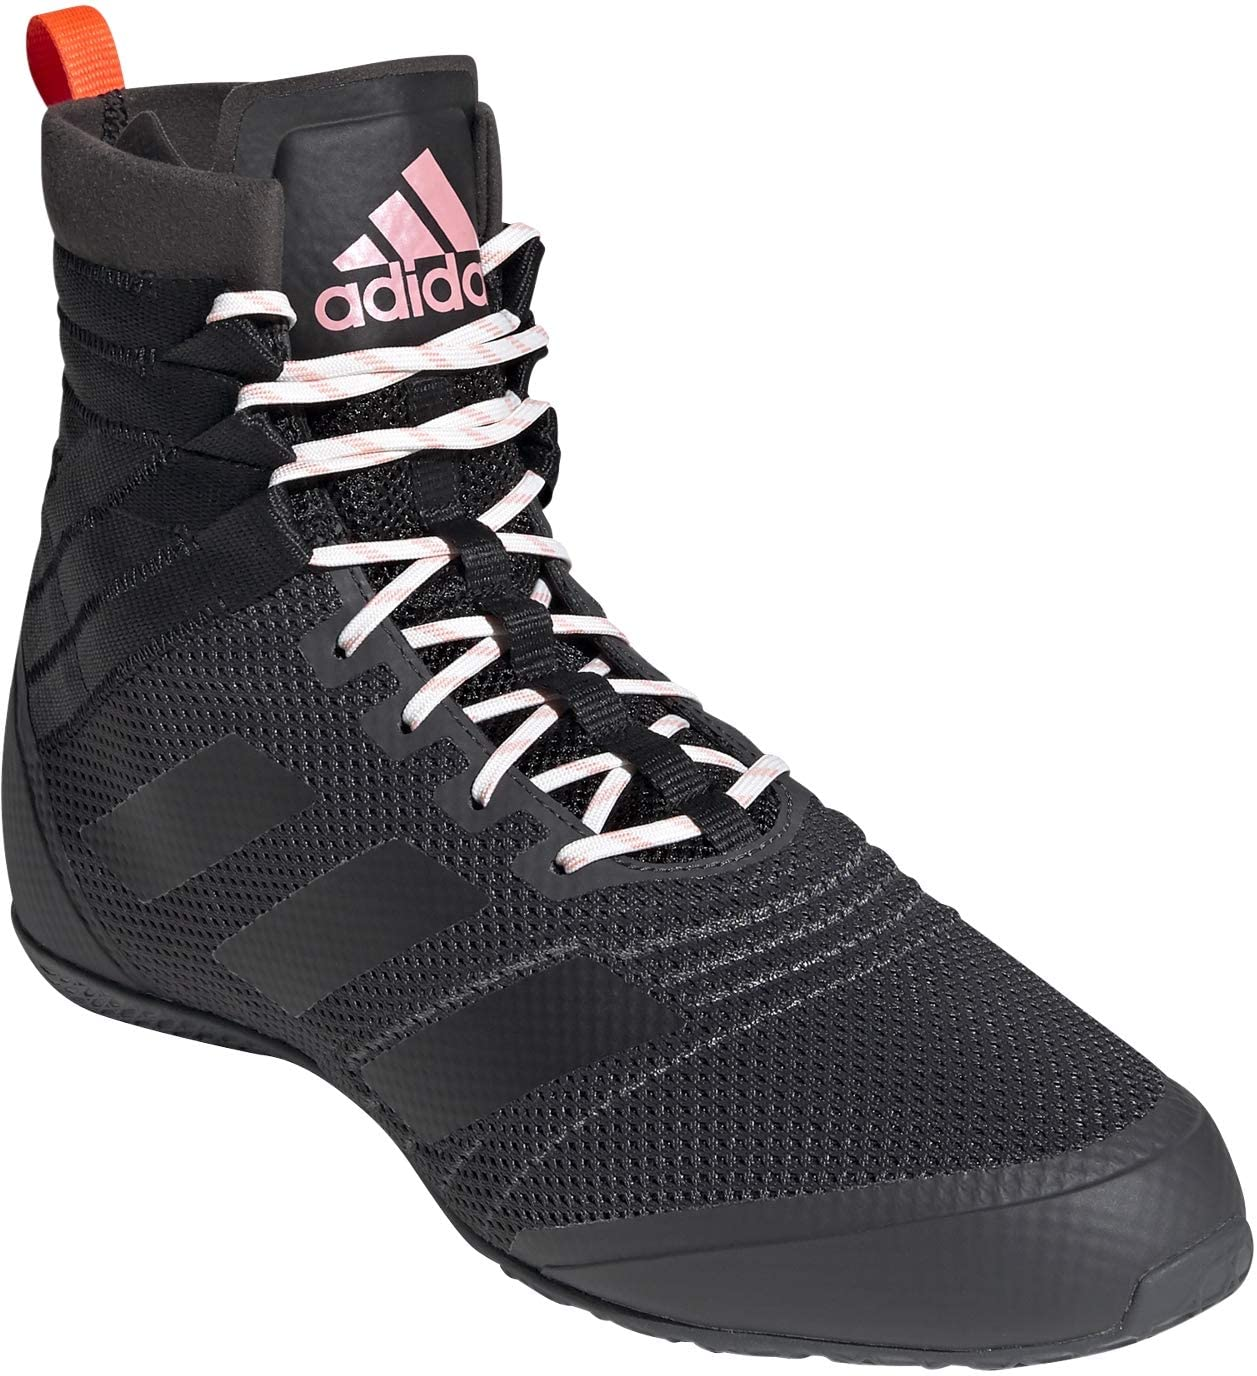 Adidas Boksschoenen – Speedex 18 Zwart Rood – 1 – jokasport.nl